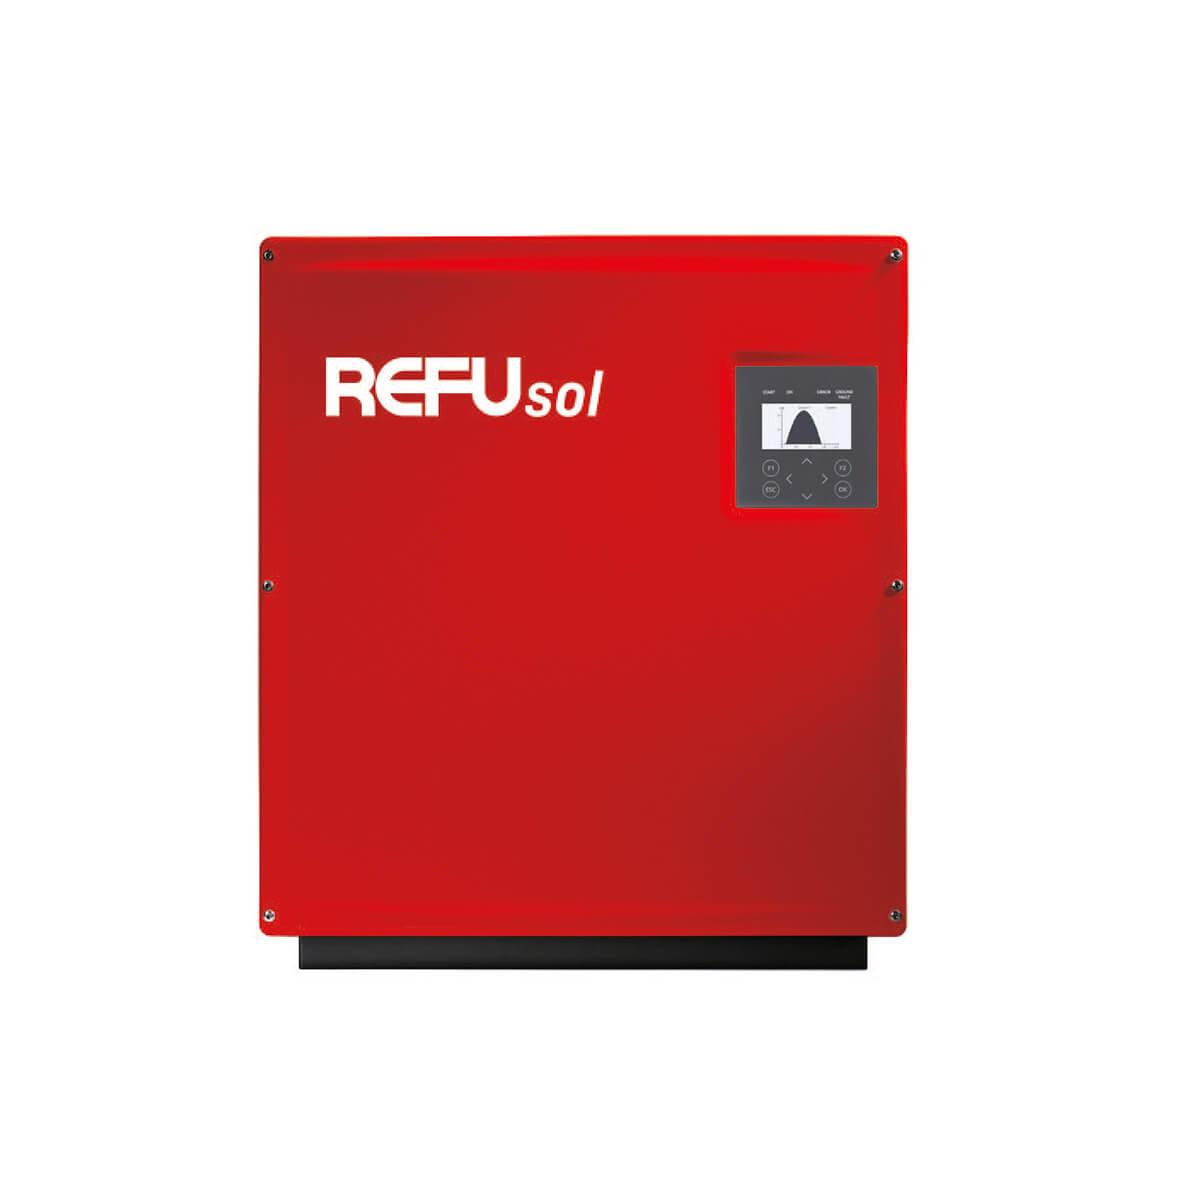 refusol 8kW inverter, refusol 08k 8kW inverter, refusol 08k inverter, refusol 08k, refusol 08k 8 kW, REFUSOL 8 KW